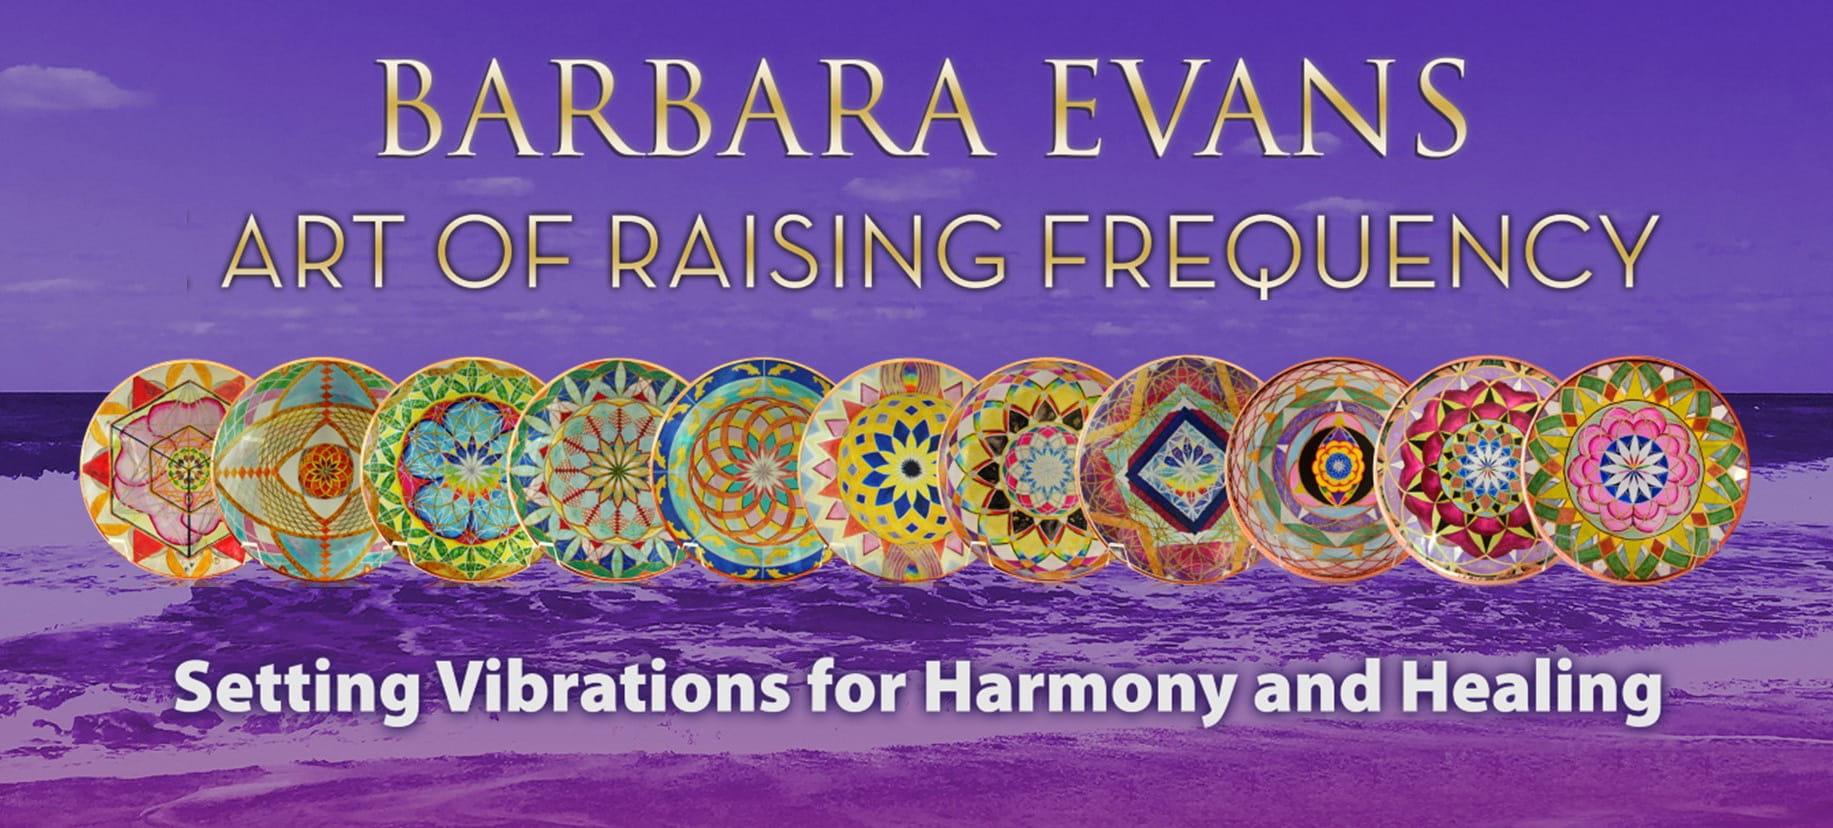 Barbara Evans - Art of Raising Frequency Banner